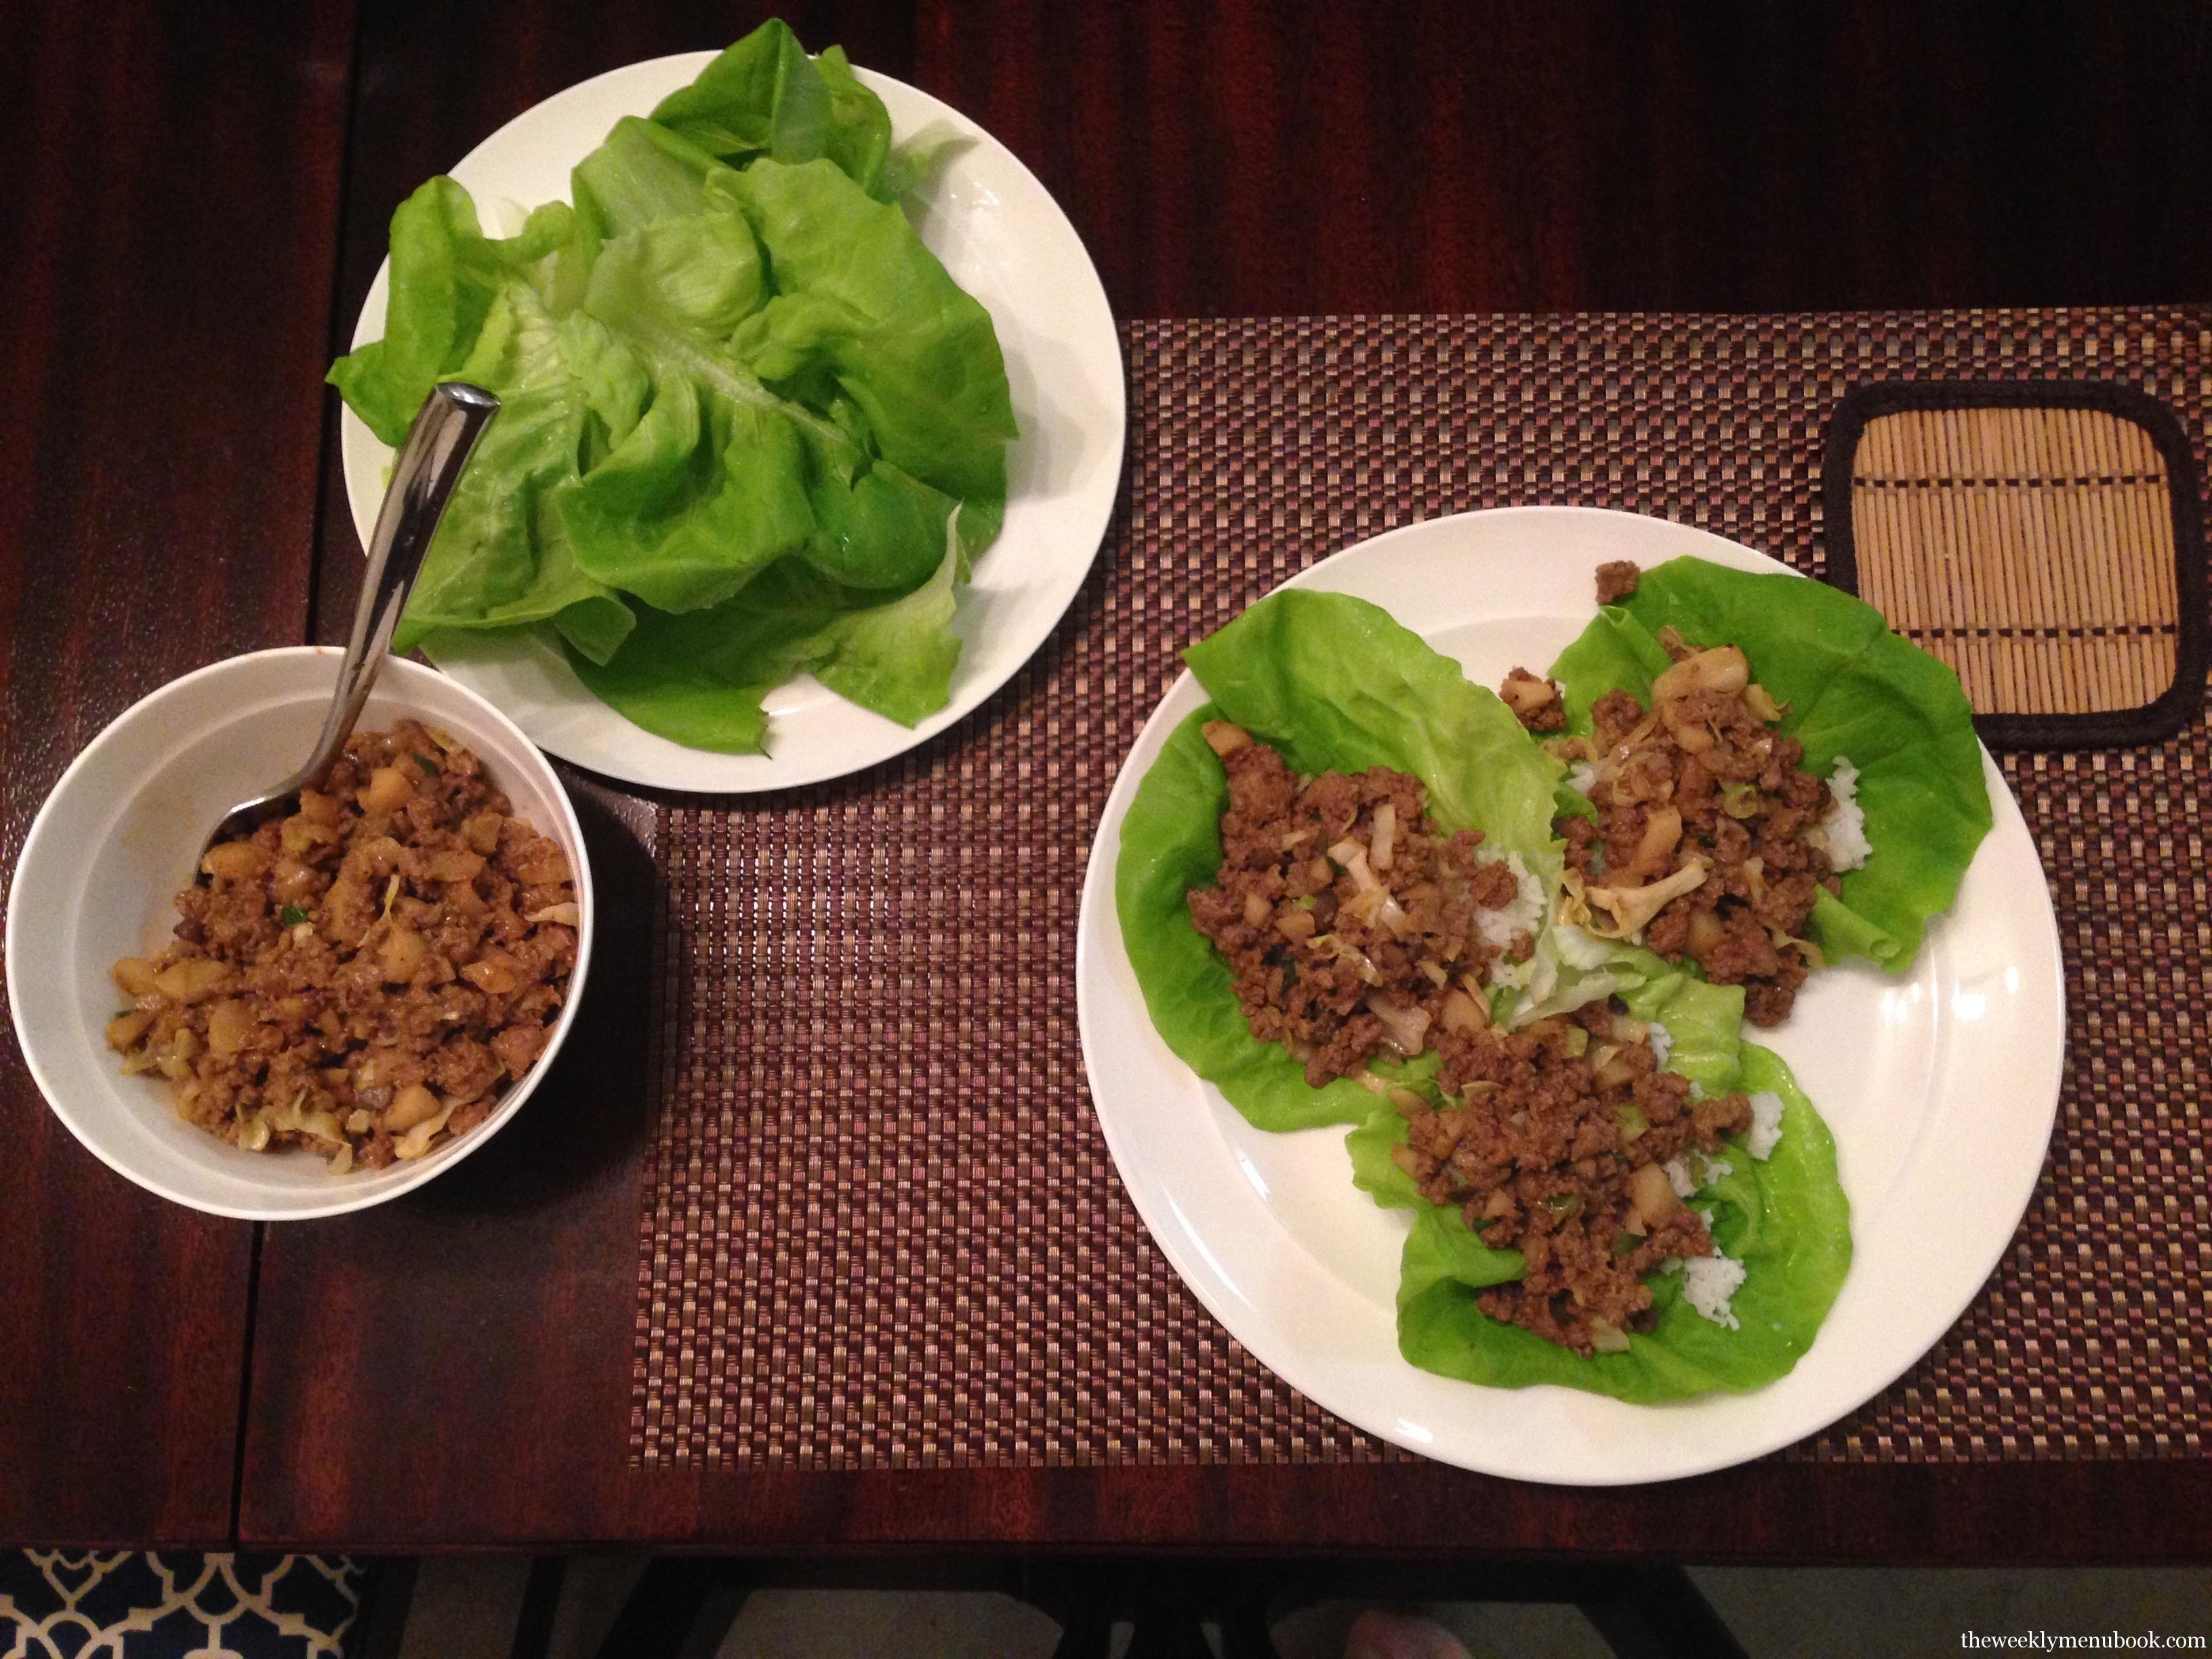 pf chang style lettuce wraps  recipe  lettuce wraps